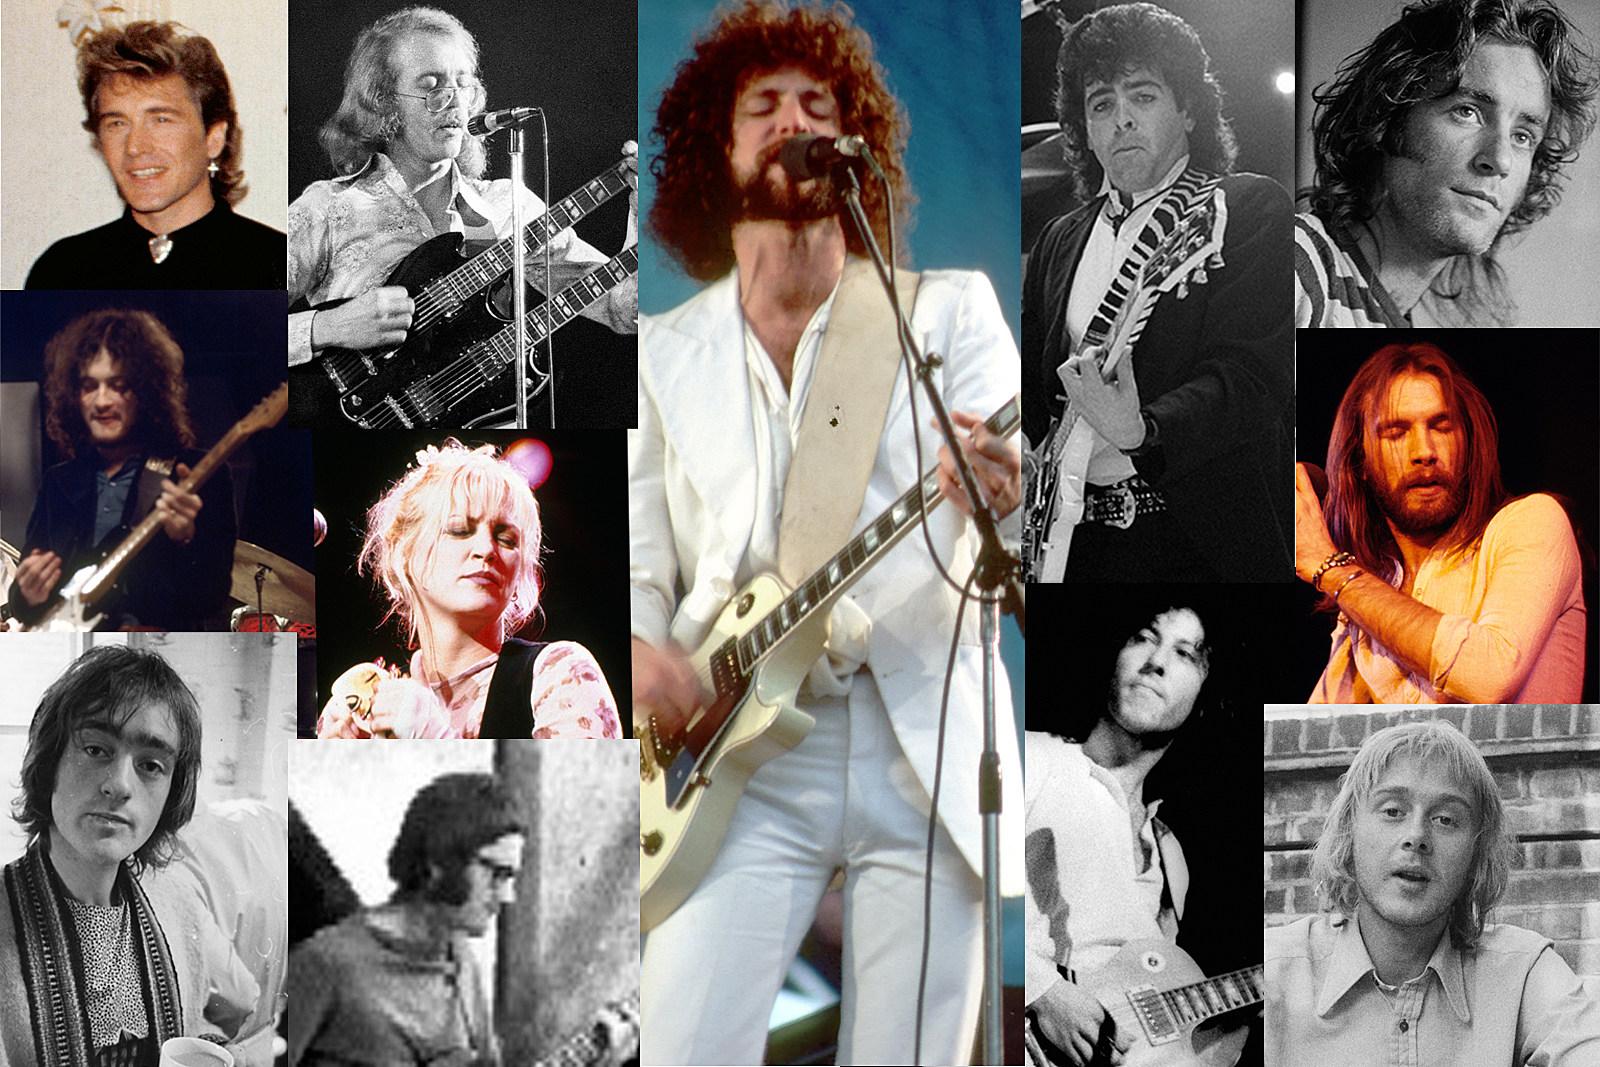 fleetwood mac band members pictures